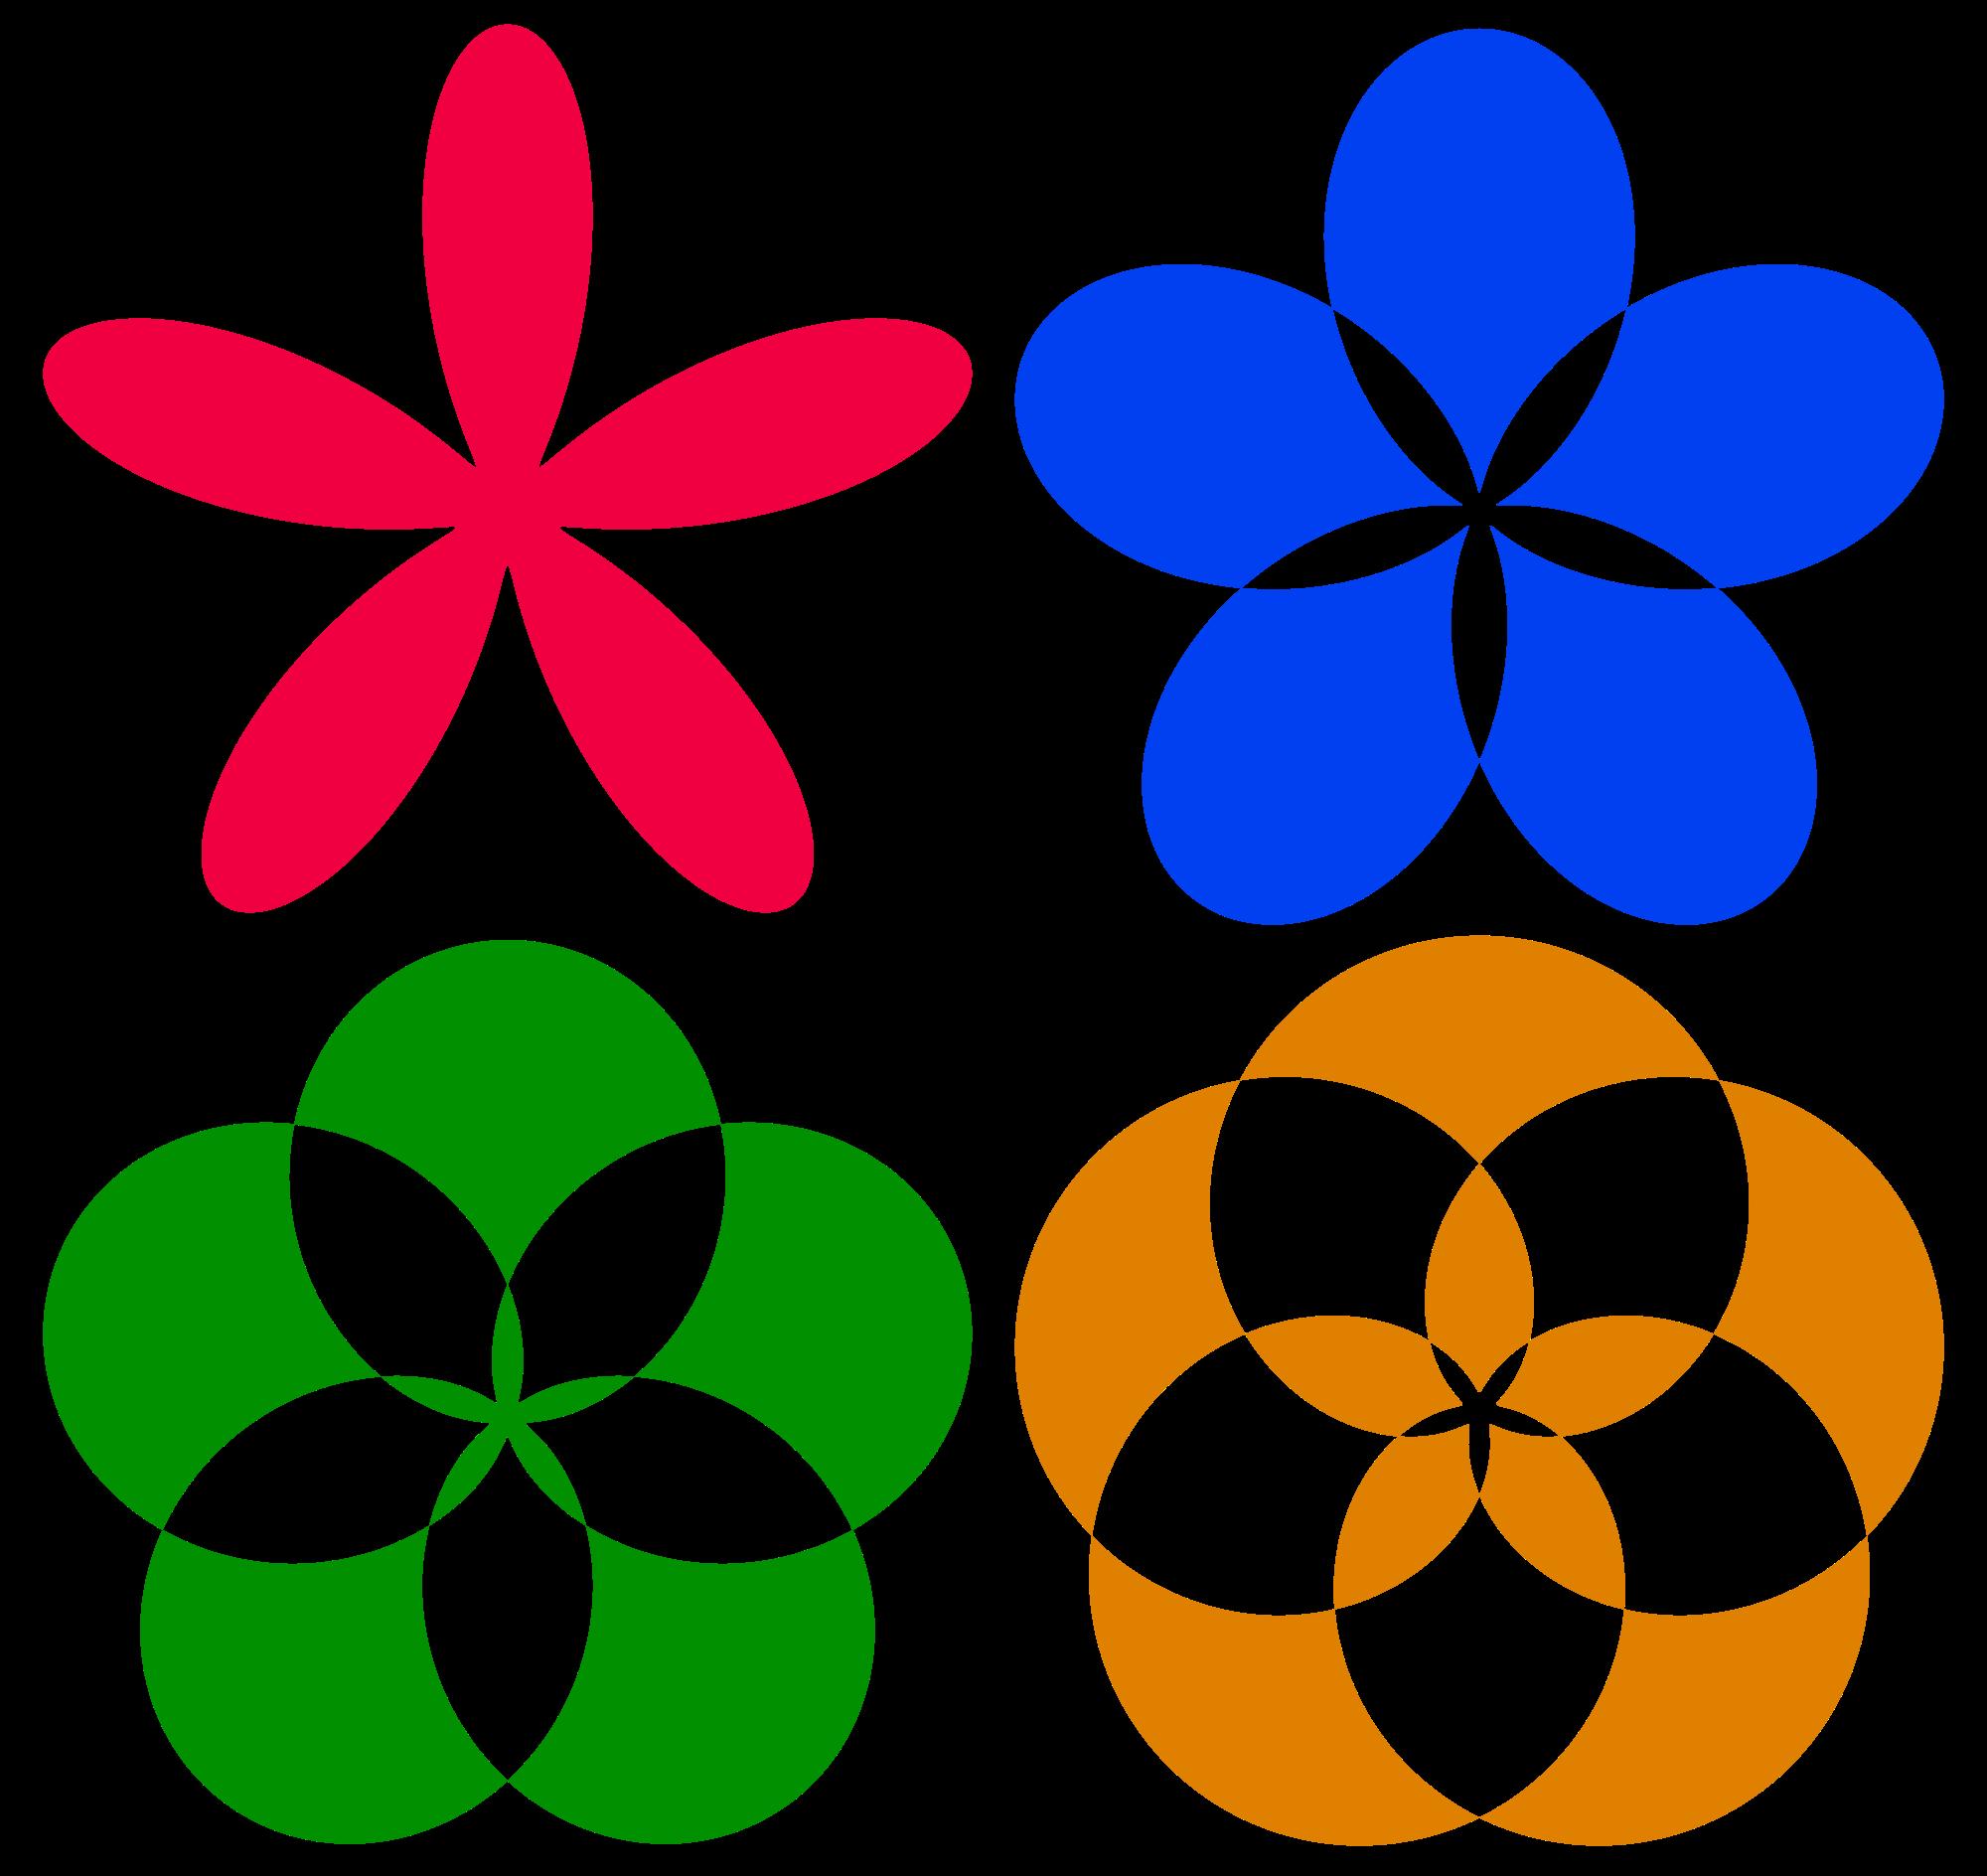 Four petal flower clipart jpg transparent download File:Mathematical-polar-equation-flowers.svg - Wikimedia Commons jpg transparent download